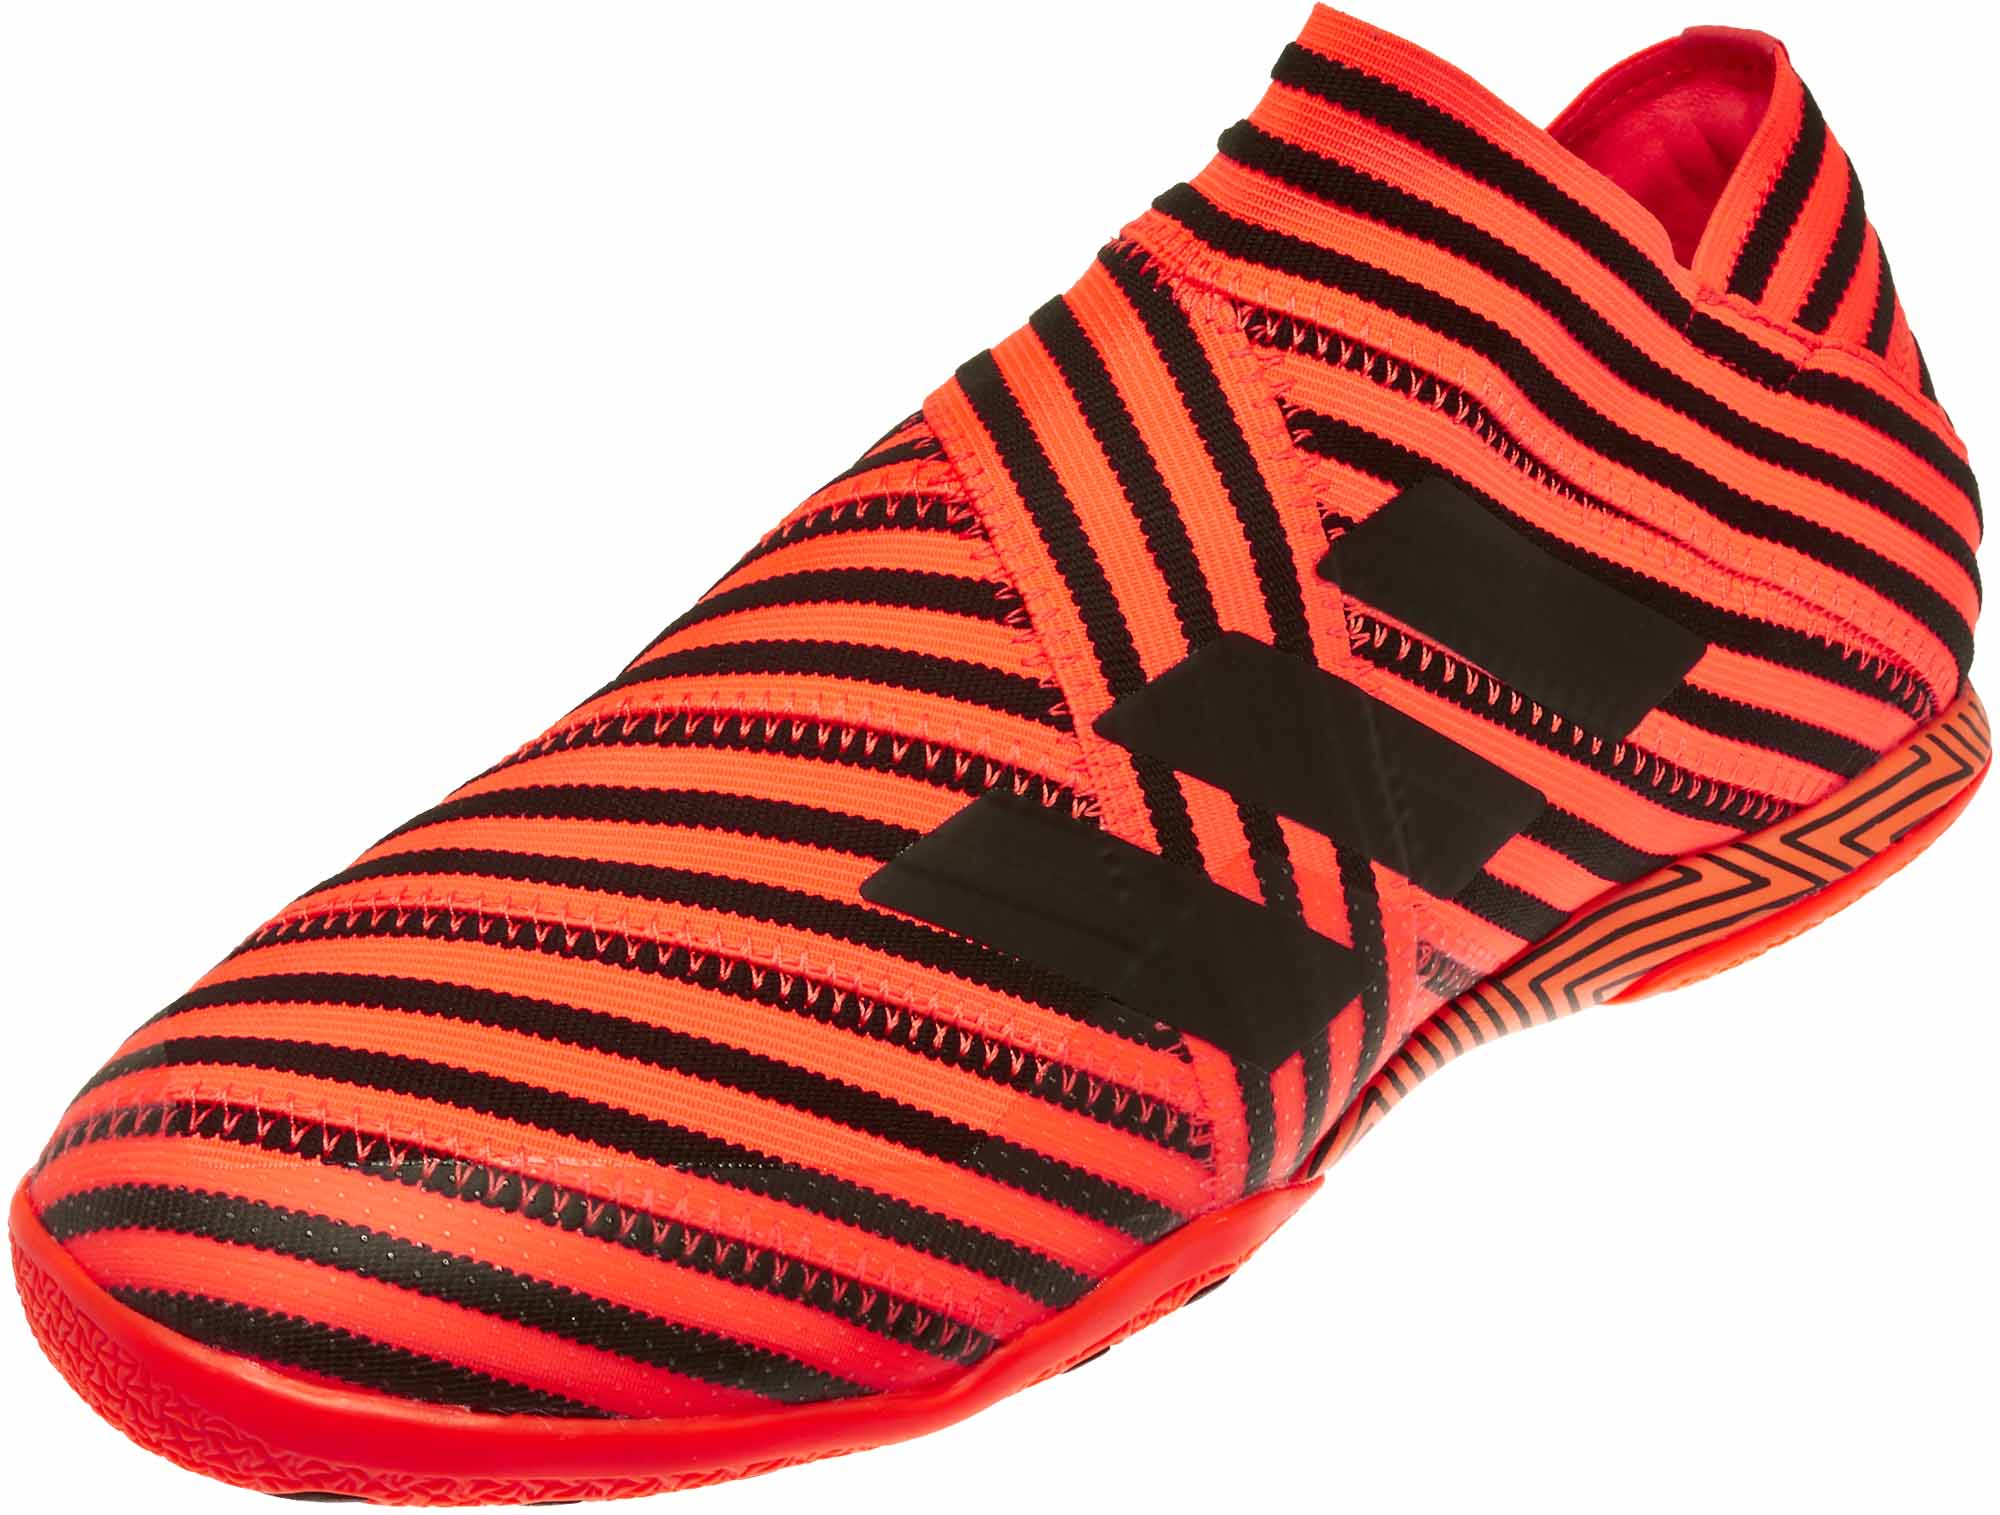 adidas Nemeziz Tango 17+ 360Agility IN Solar Red & Core